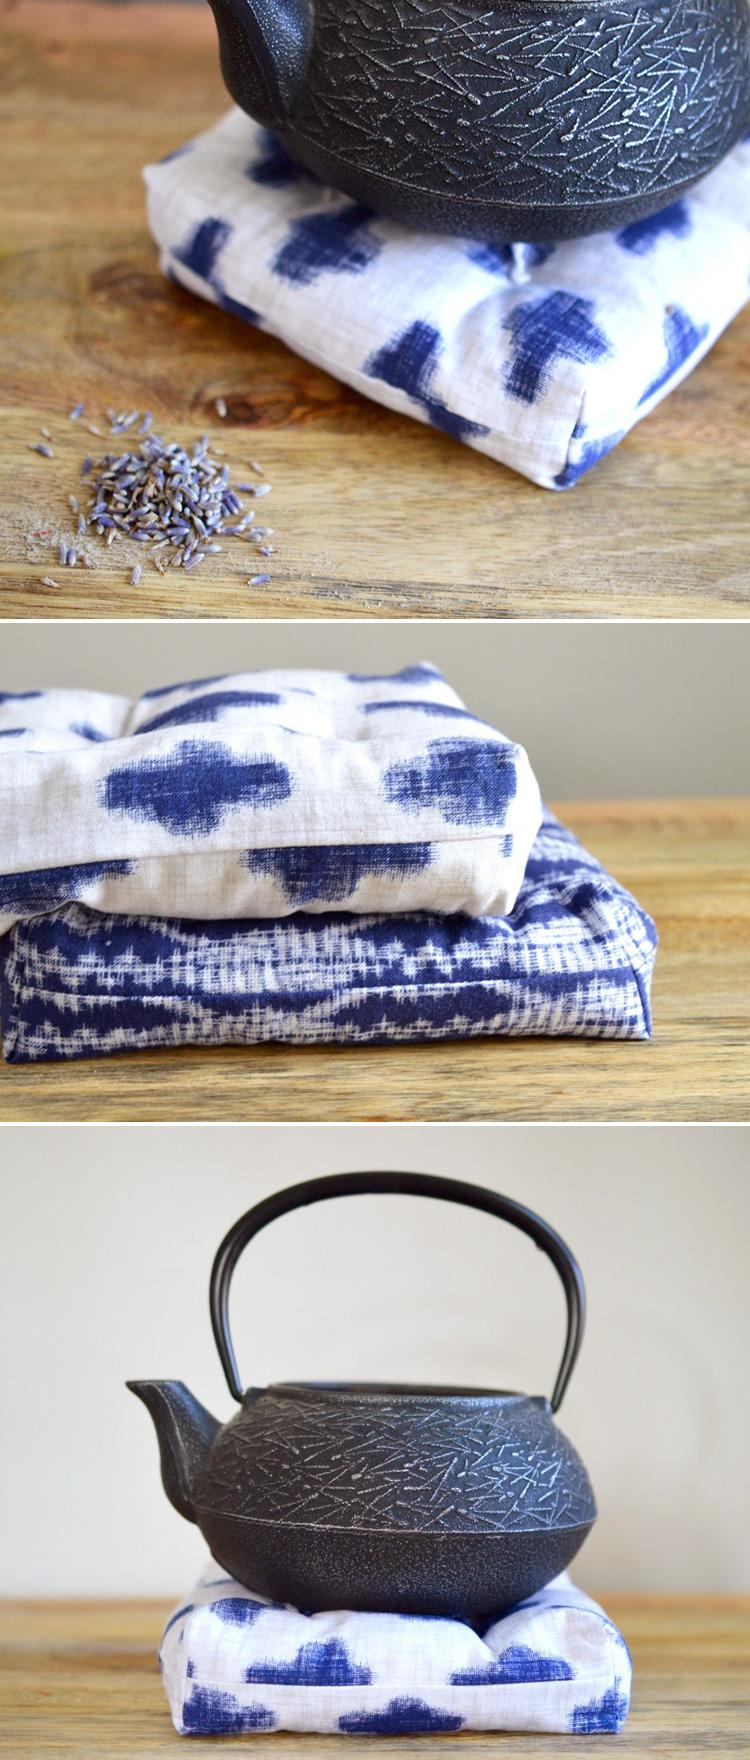 Sew this awesome tea trivet!